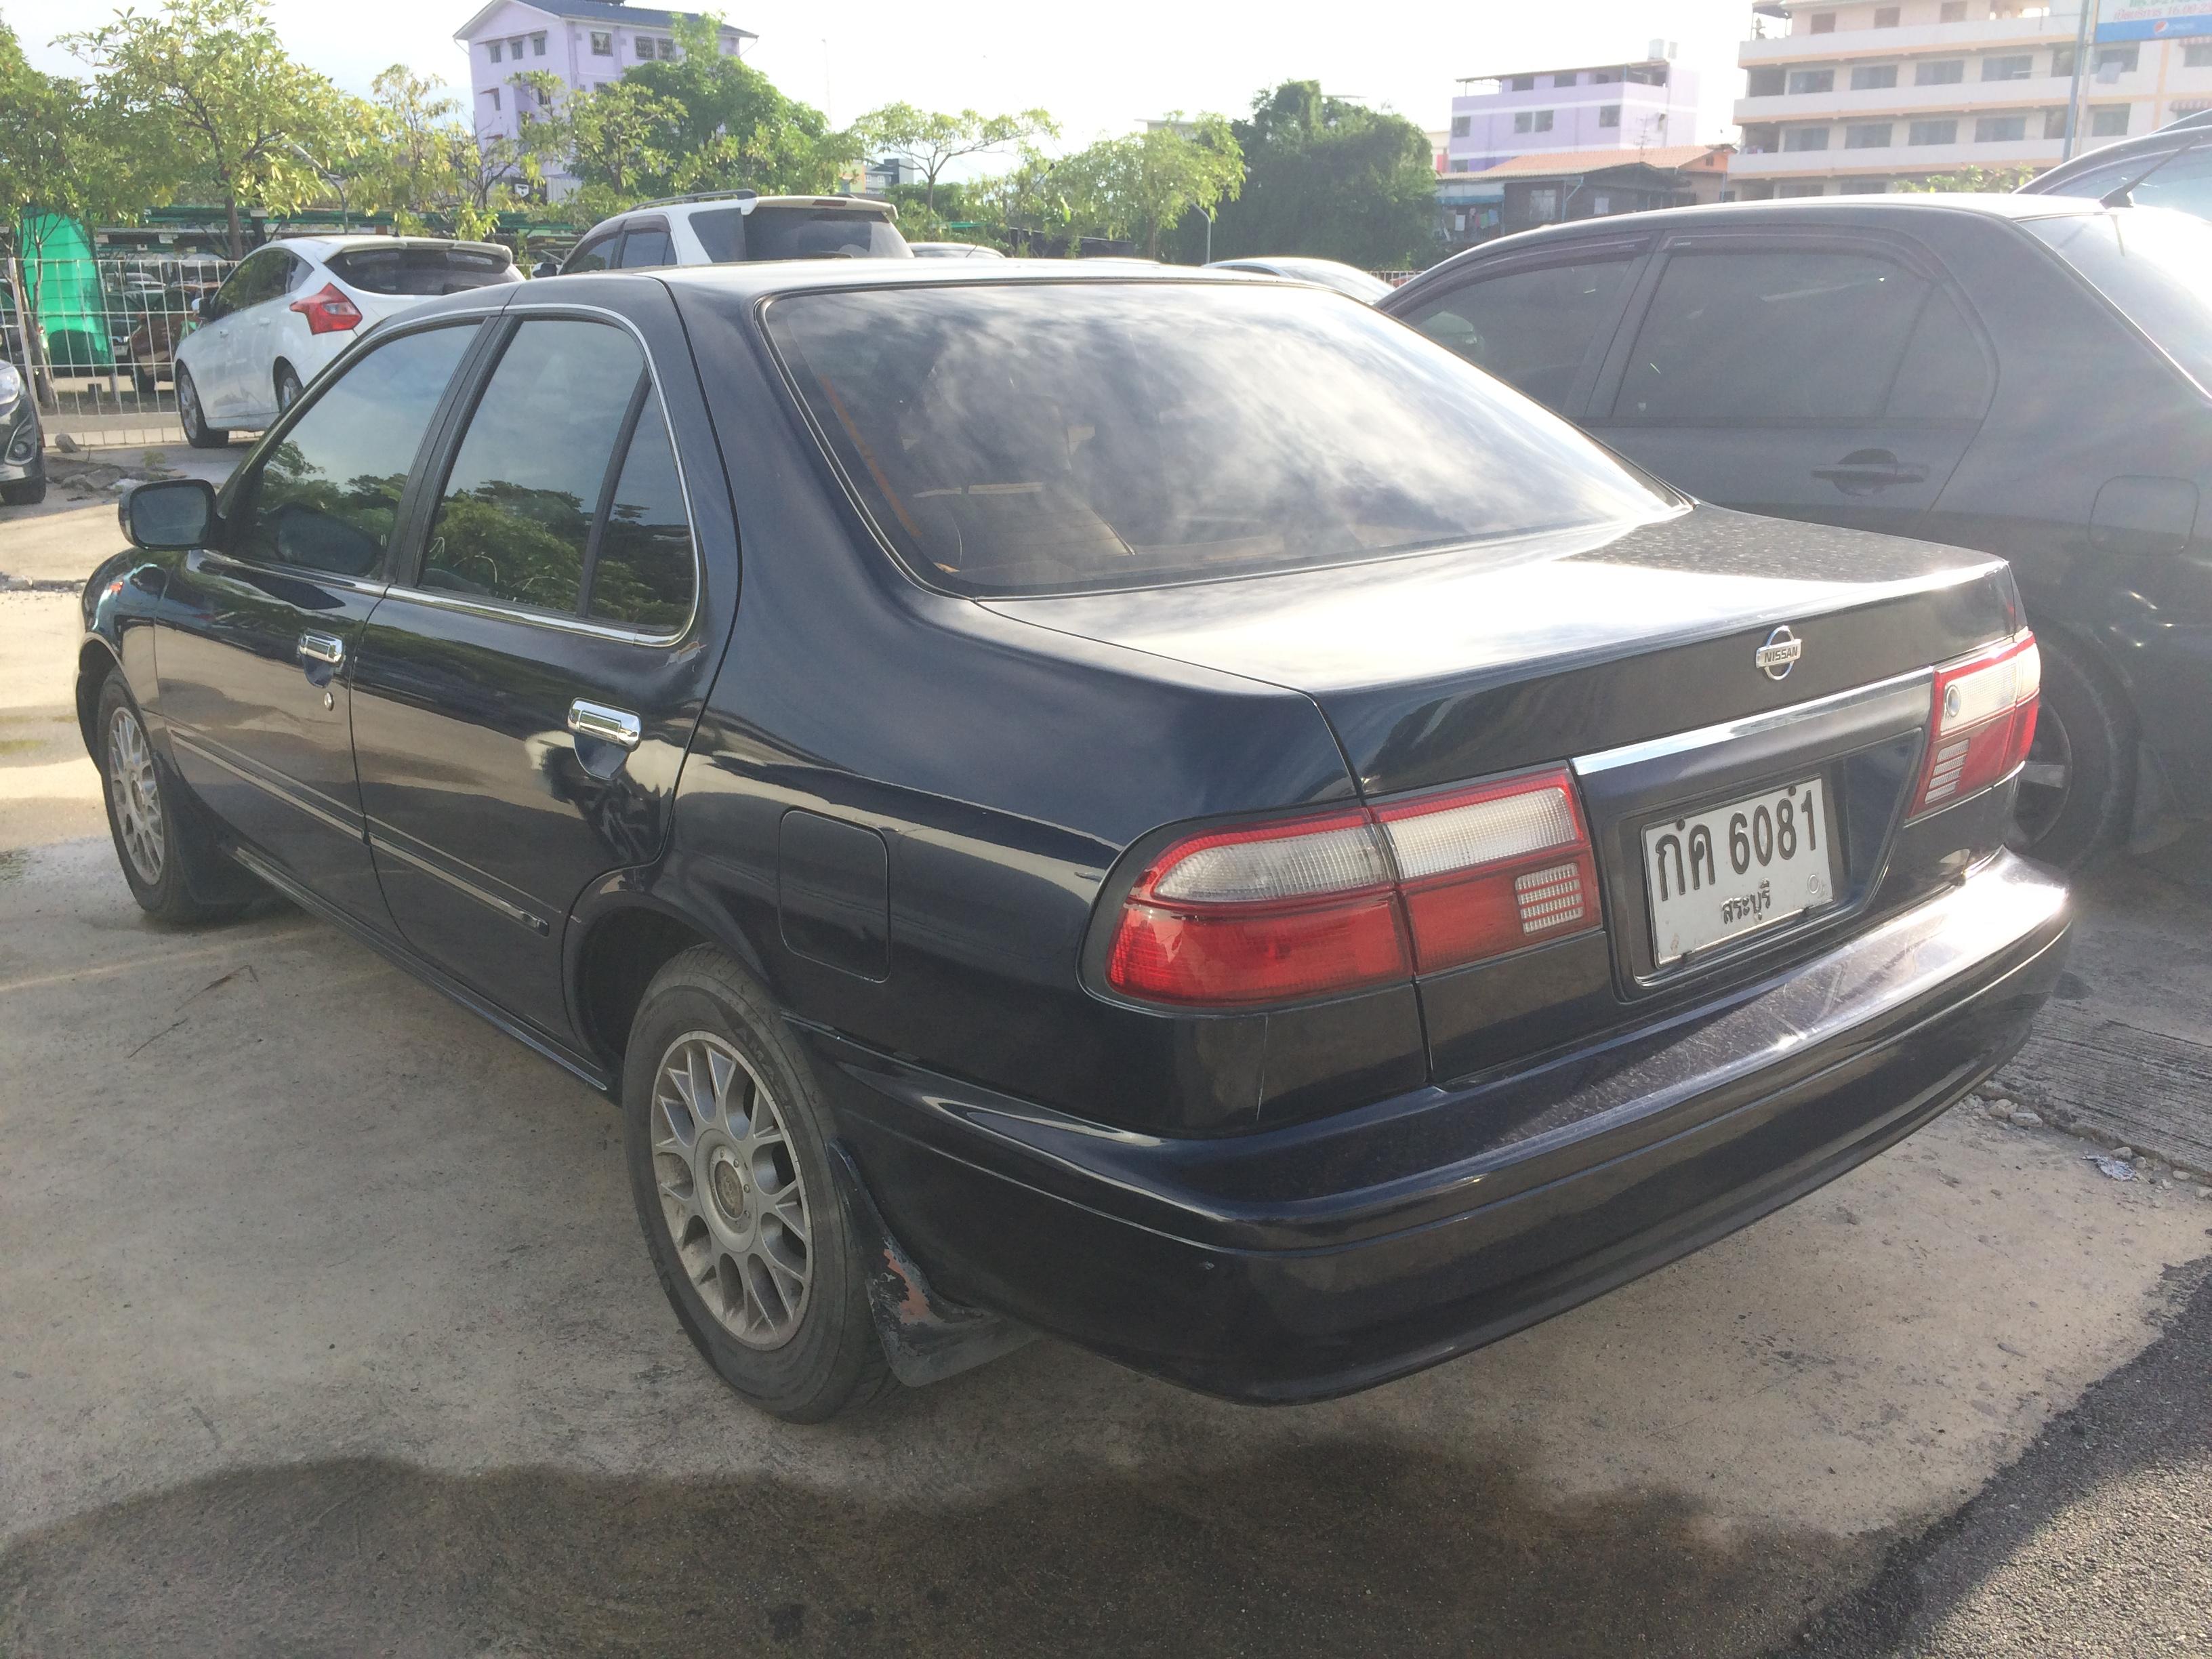 File 1999 2000 Nissan Sunny B14 1 6 Super Saloon Sedan 08 06 2018